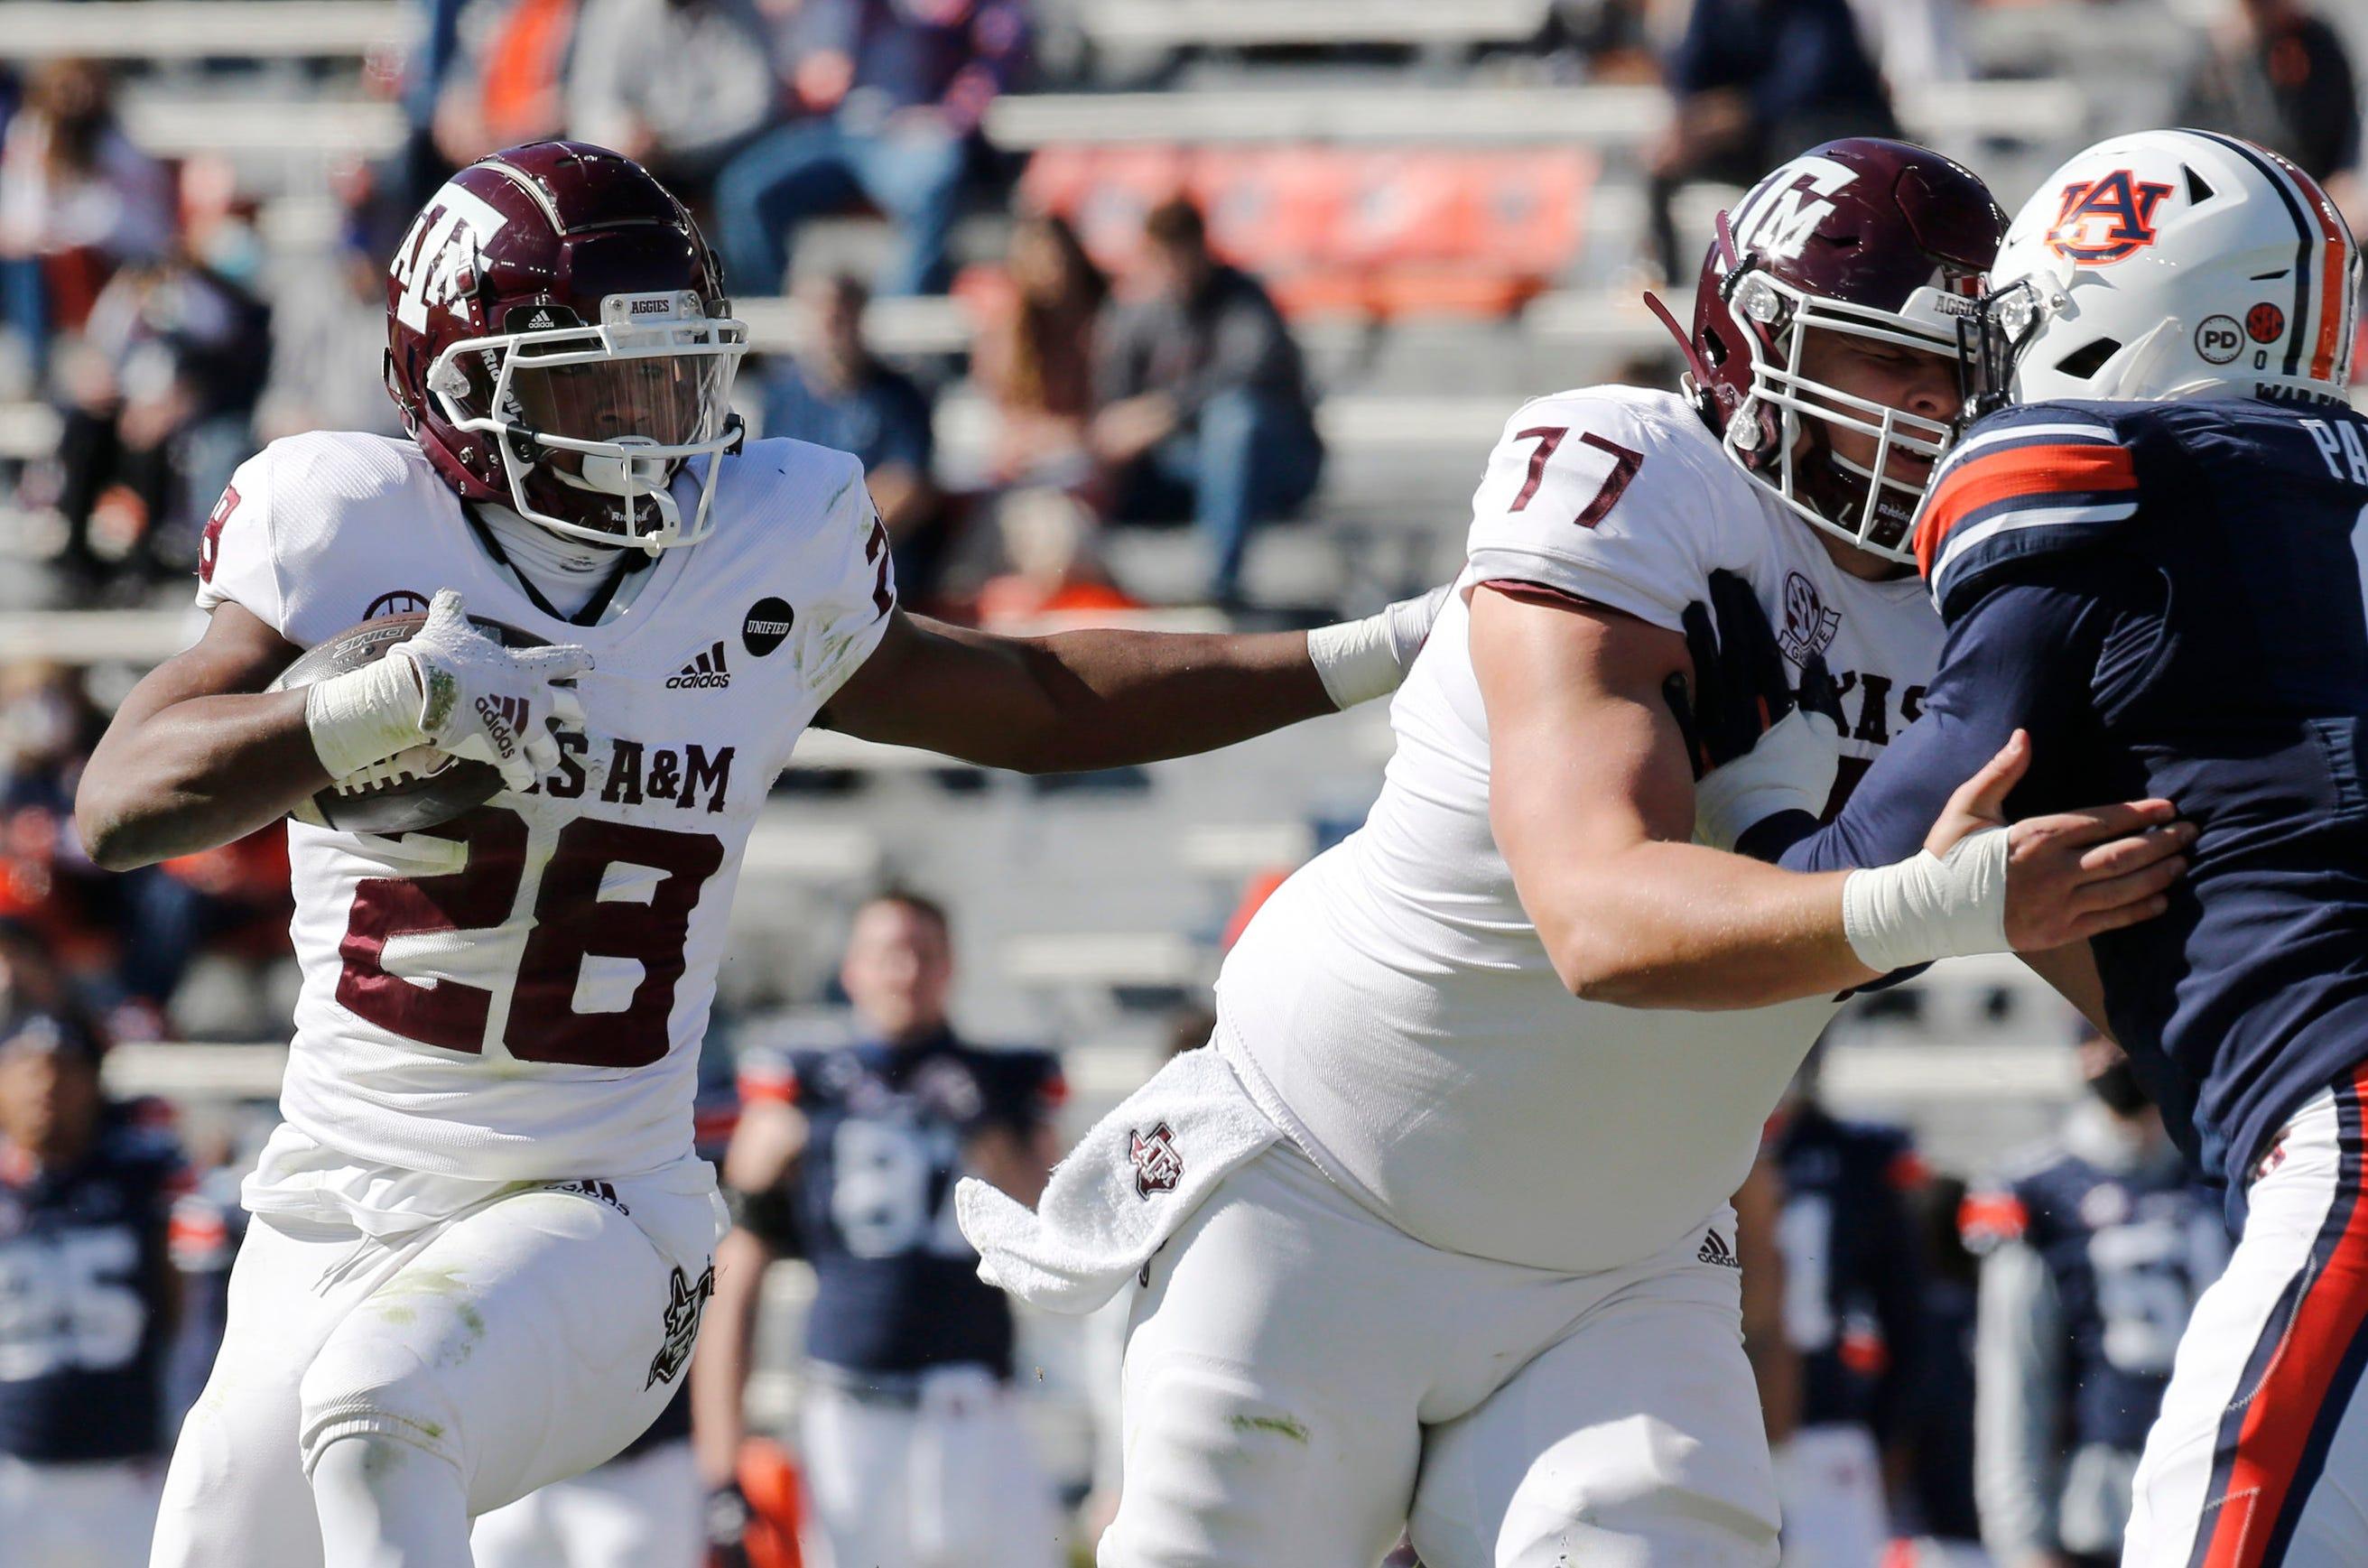 SEC postpones Saturday's football game between No. 5 Texas A&M and Ole Miss